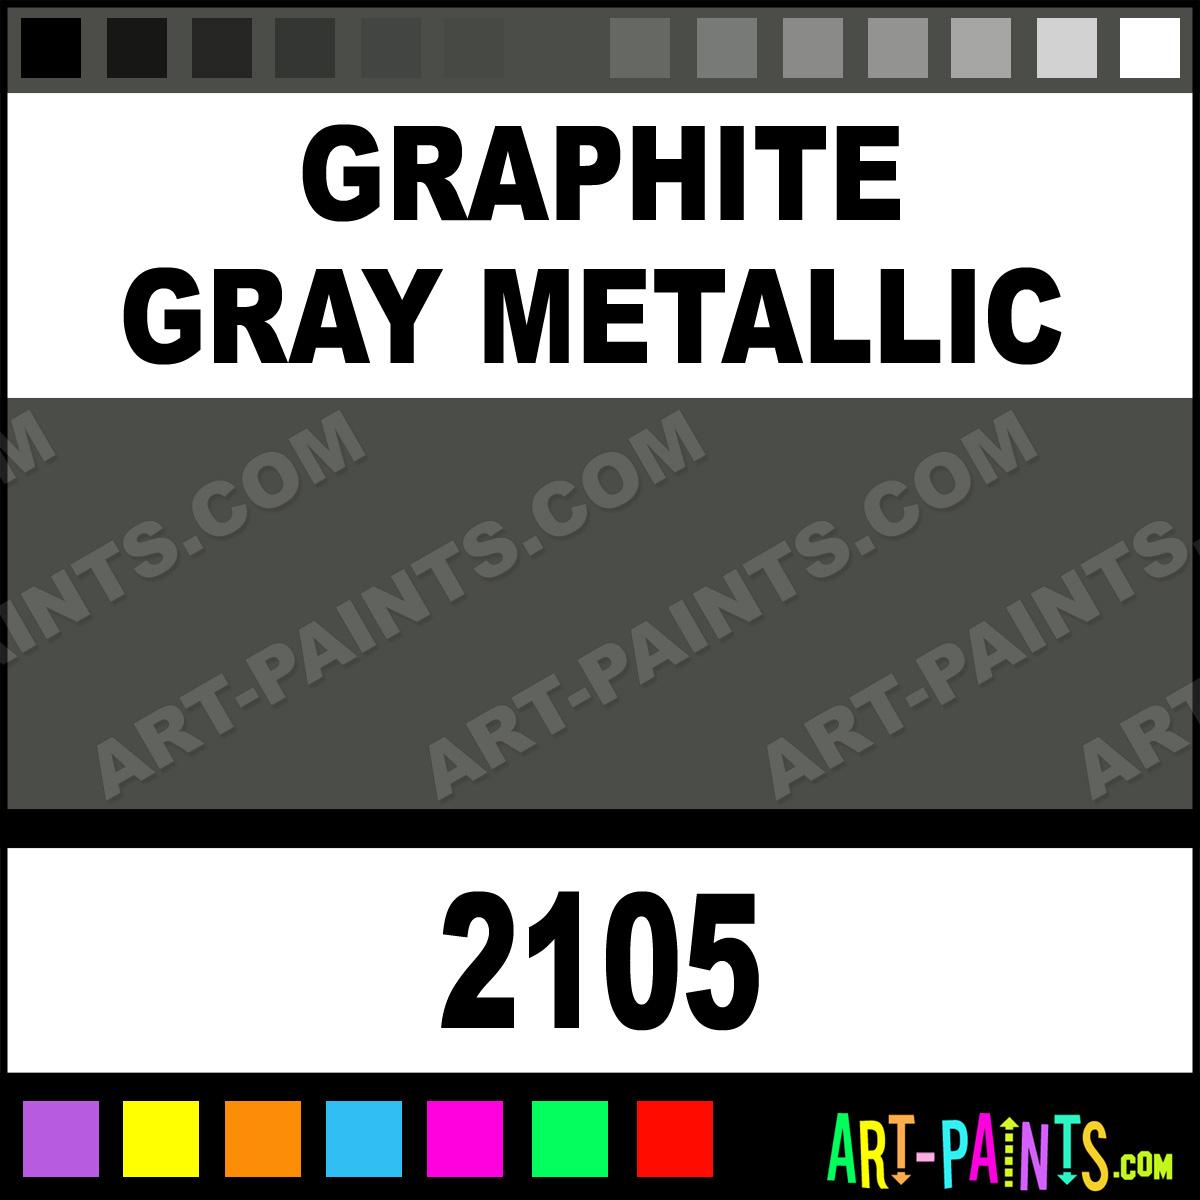 Acrylic Enamel Paint >> Graphite Gray Metallic Acrylic Enamel Paints - 2105 - Graphite Gray Metallic Paint, Graphite ...